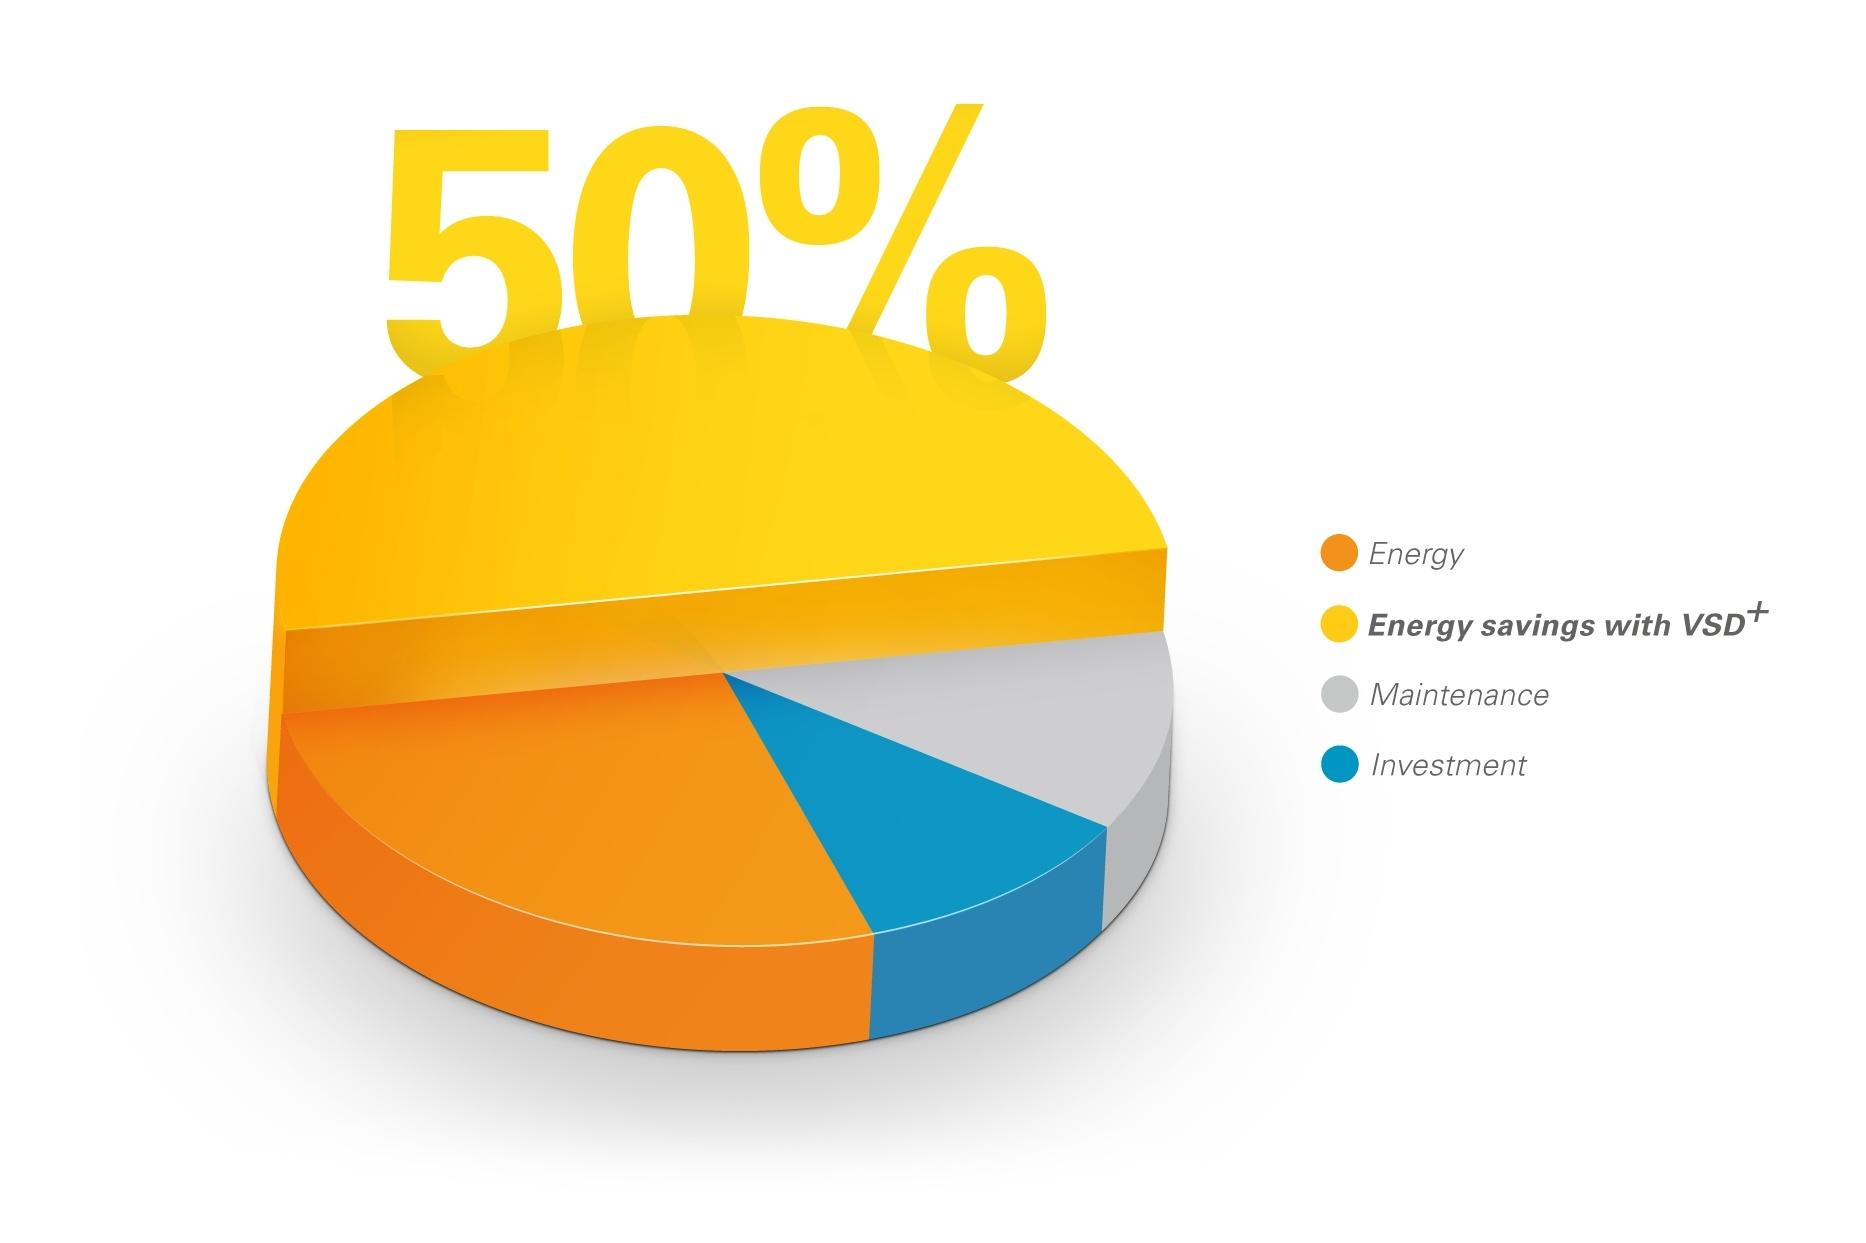 VSDplus-pie-chart.jpg